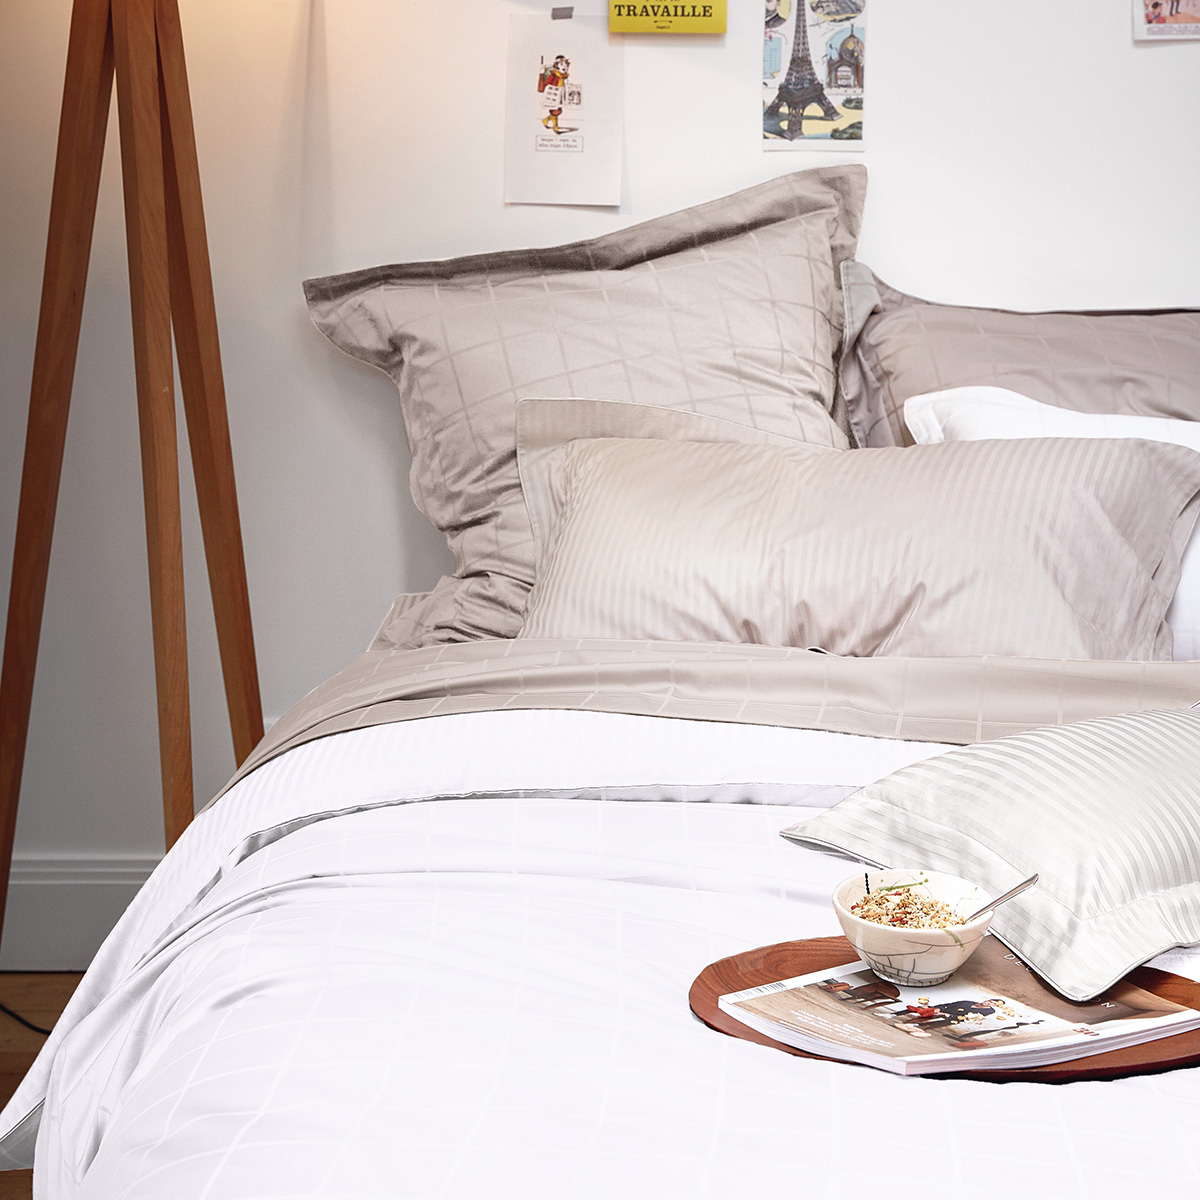 Drap housse satin Blanc 160 x 200 cm